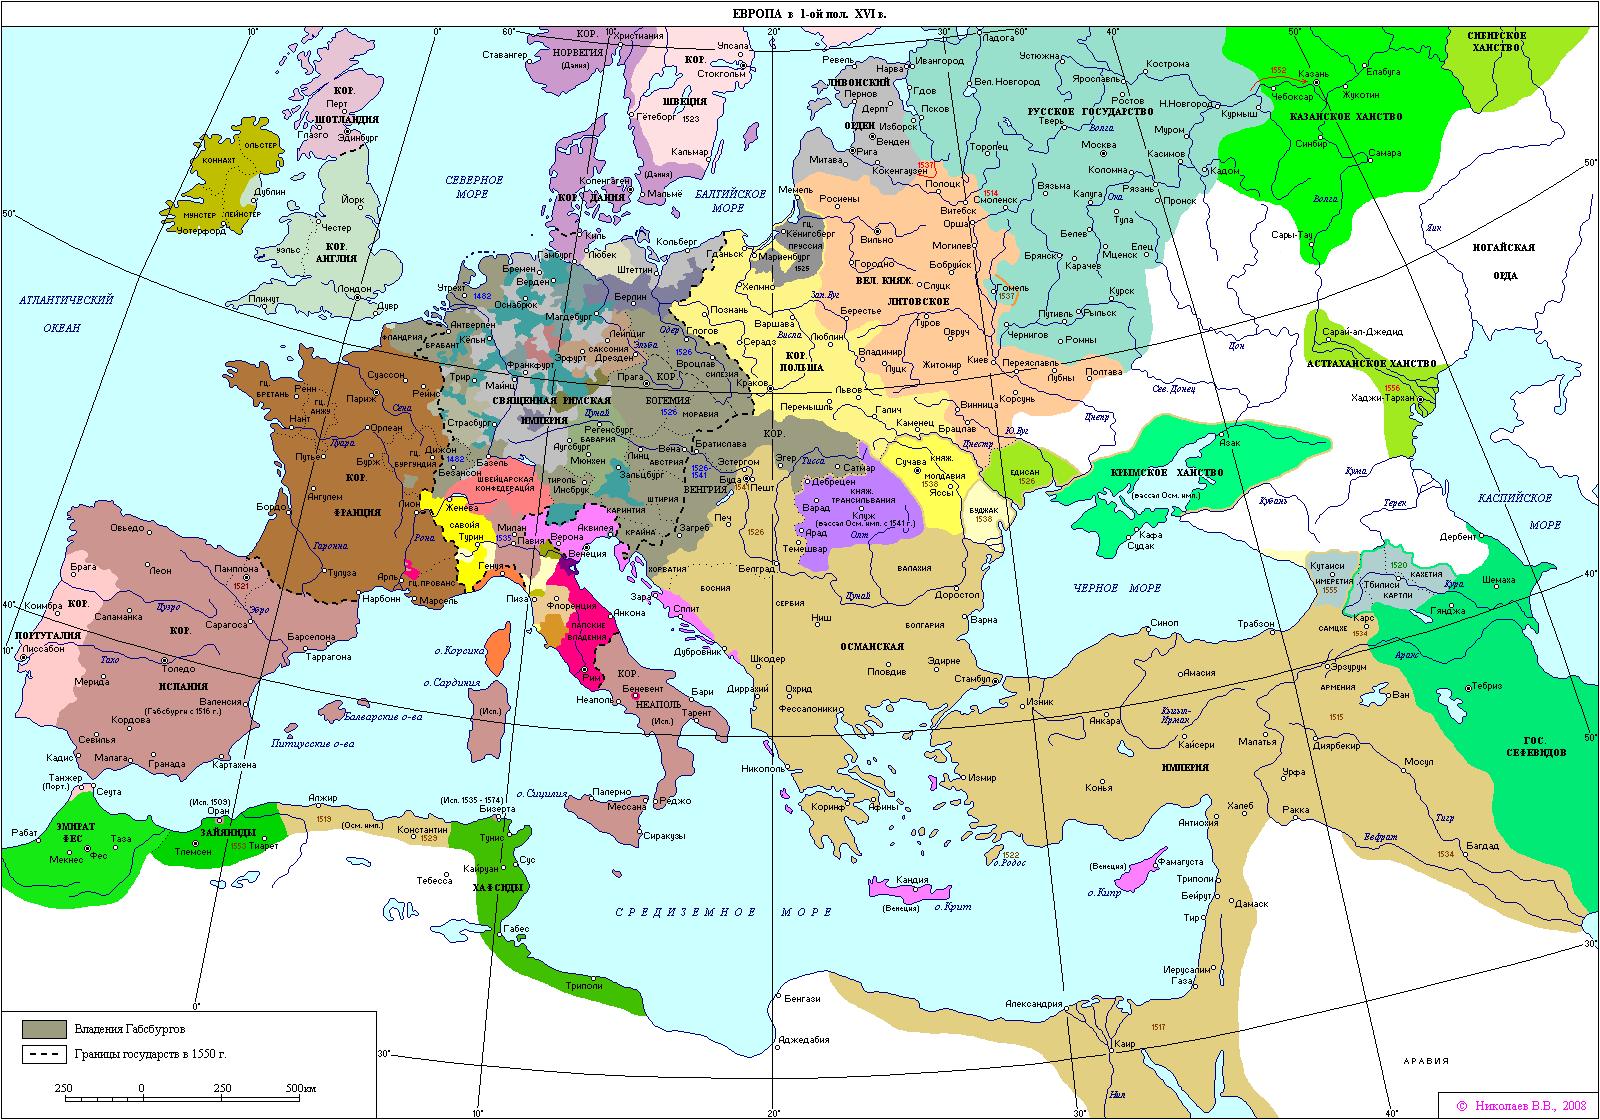 039-europe1500-1550